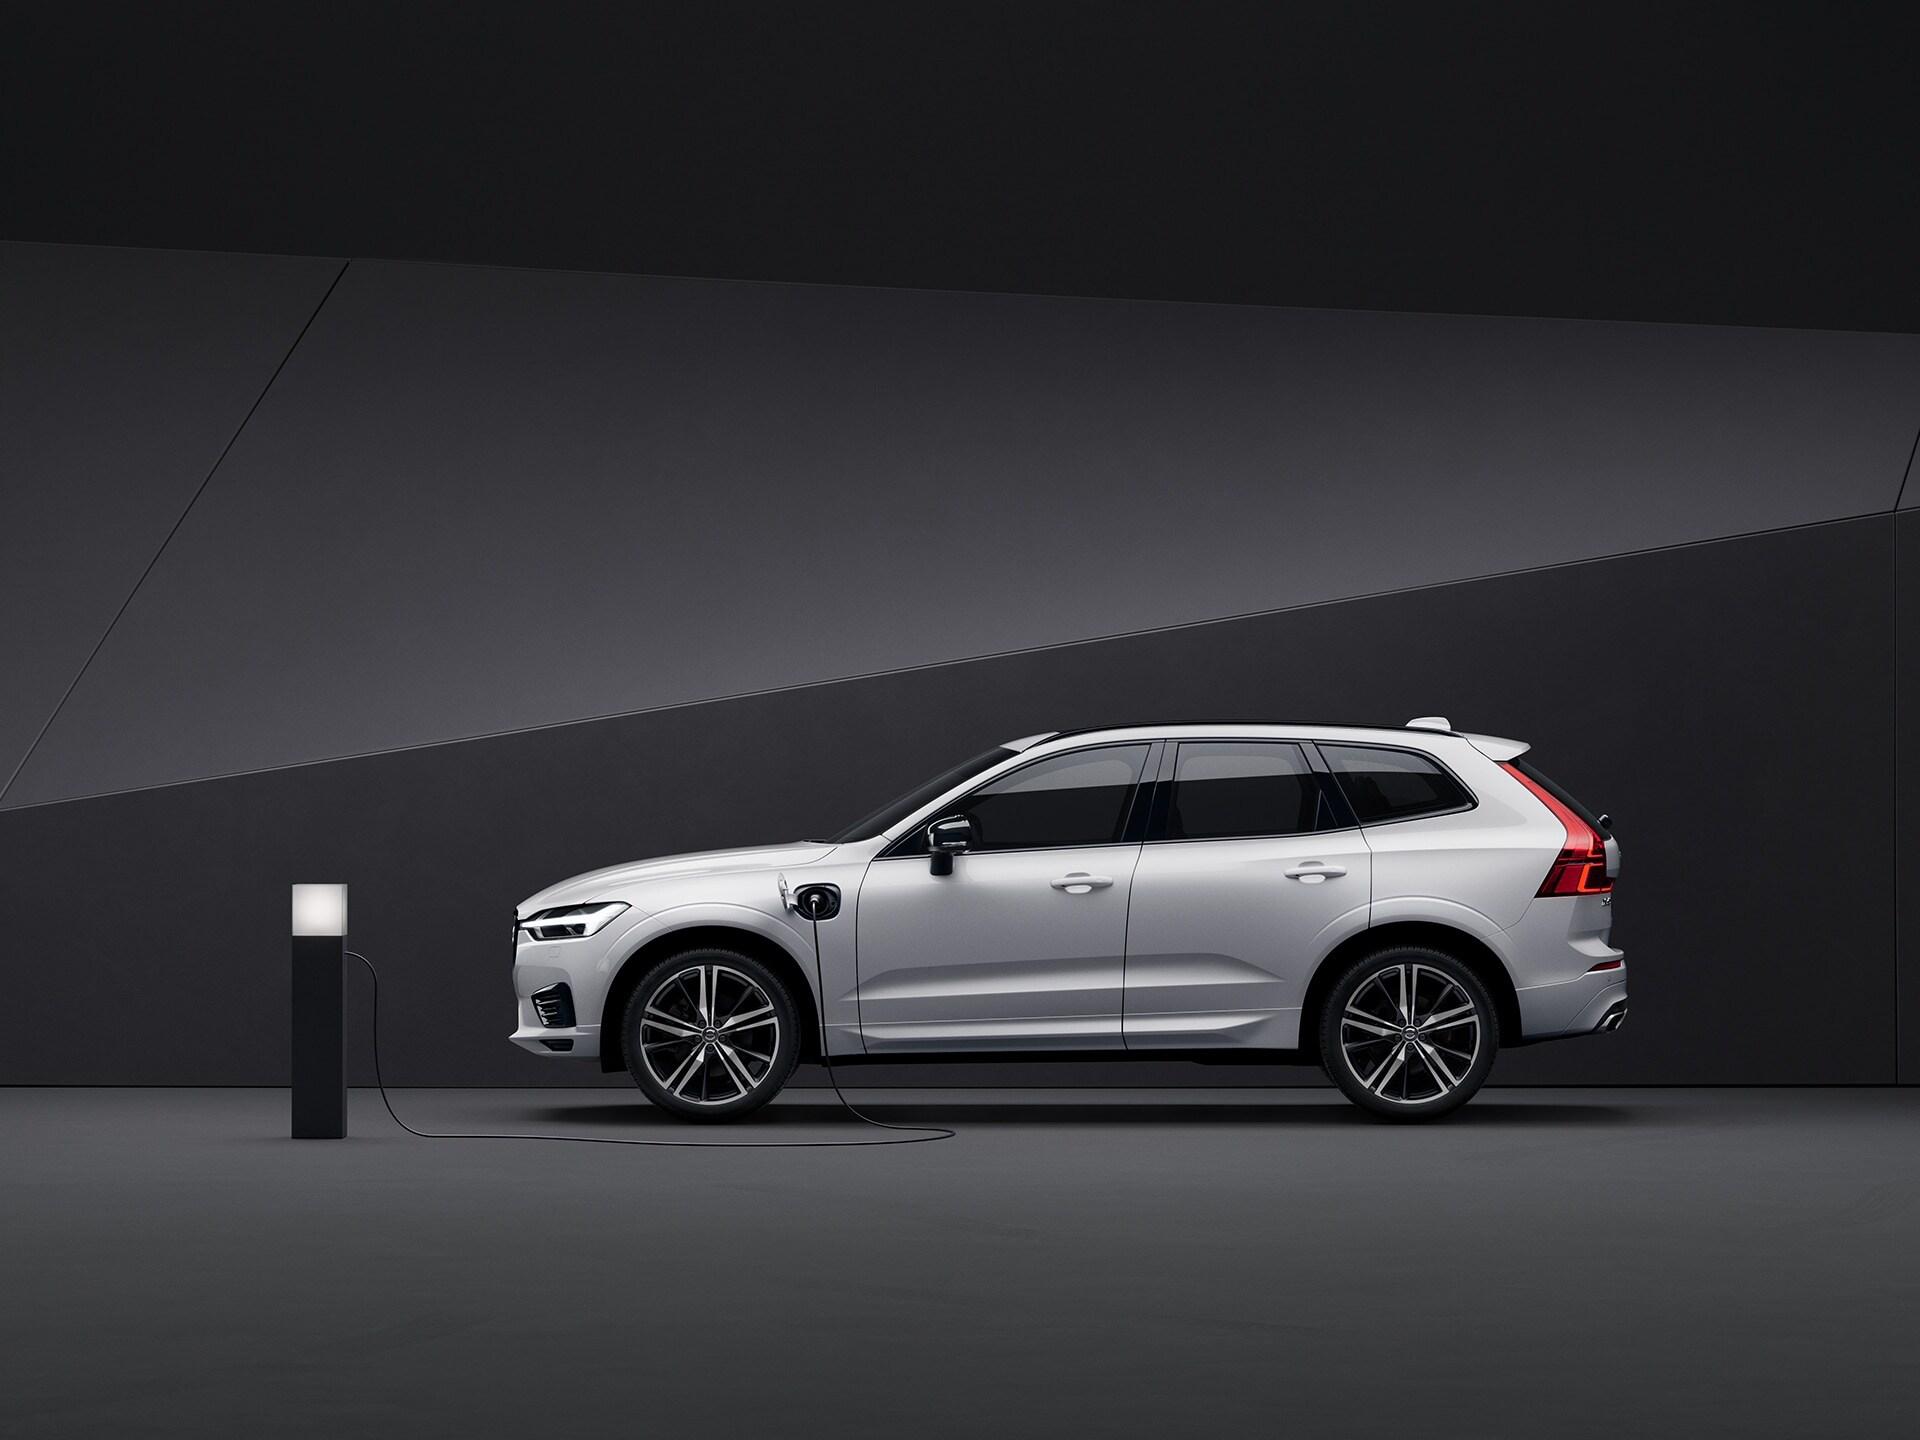 Белый Volvo XC60 Recharge заряжается на черном фоне